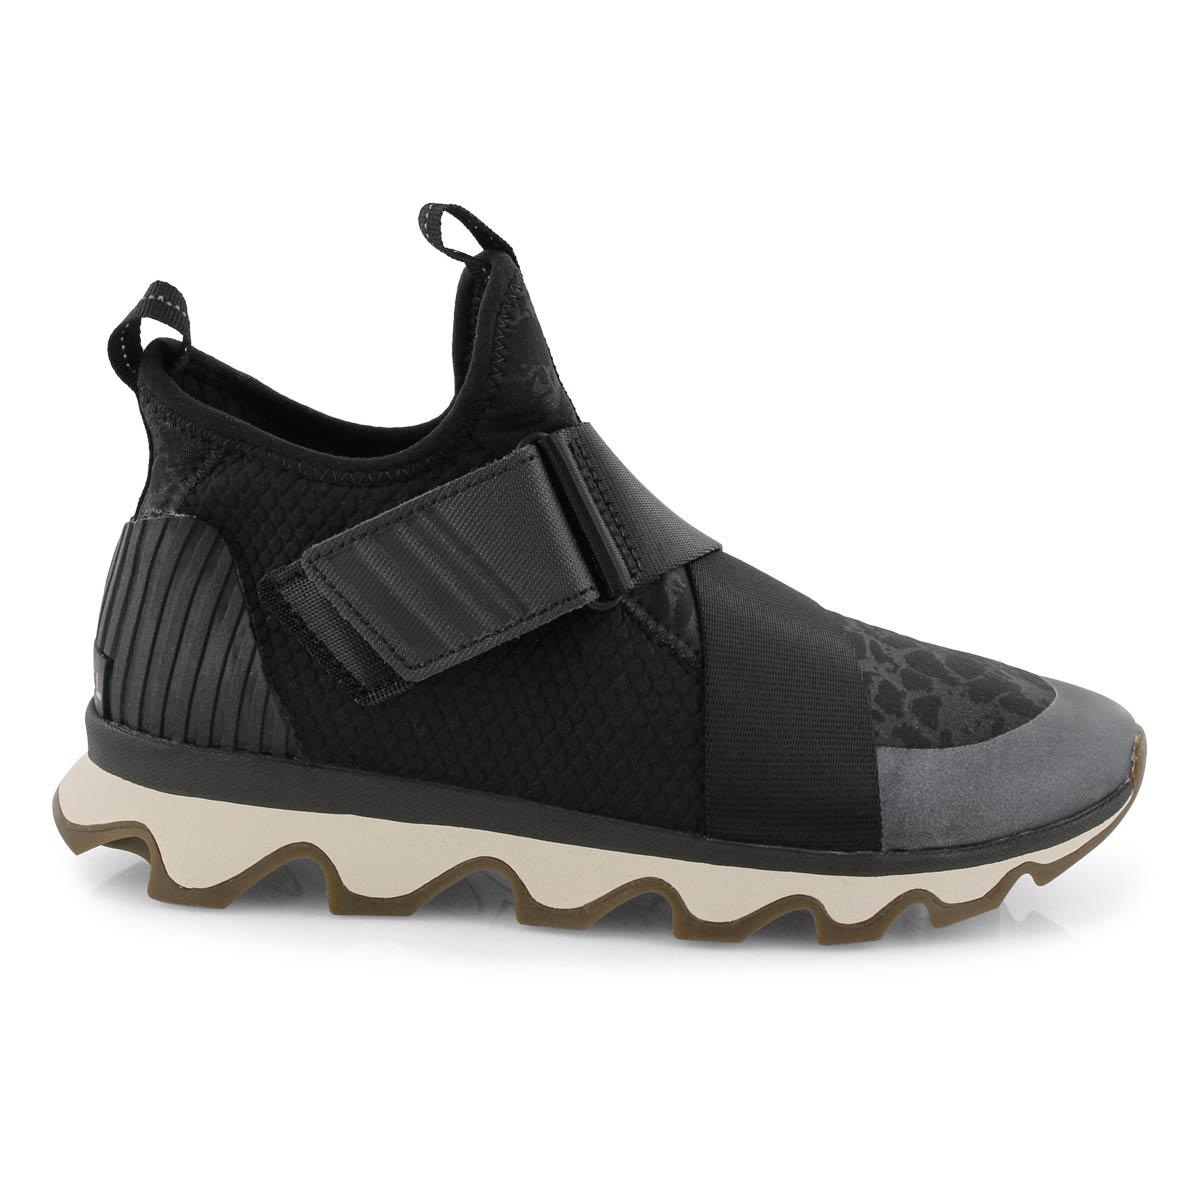 Lds Kinetic Sneak black fashion sneaker